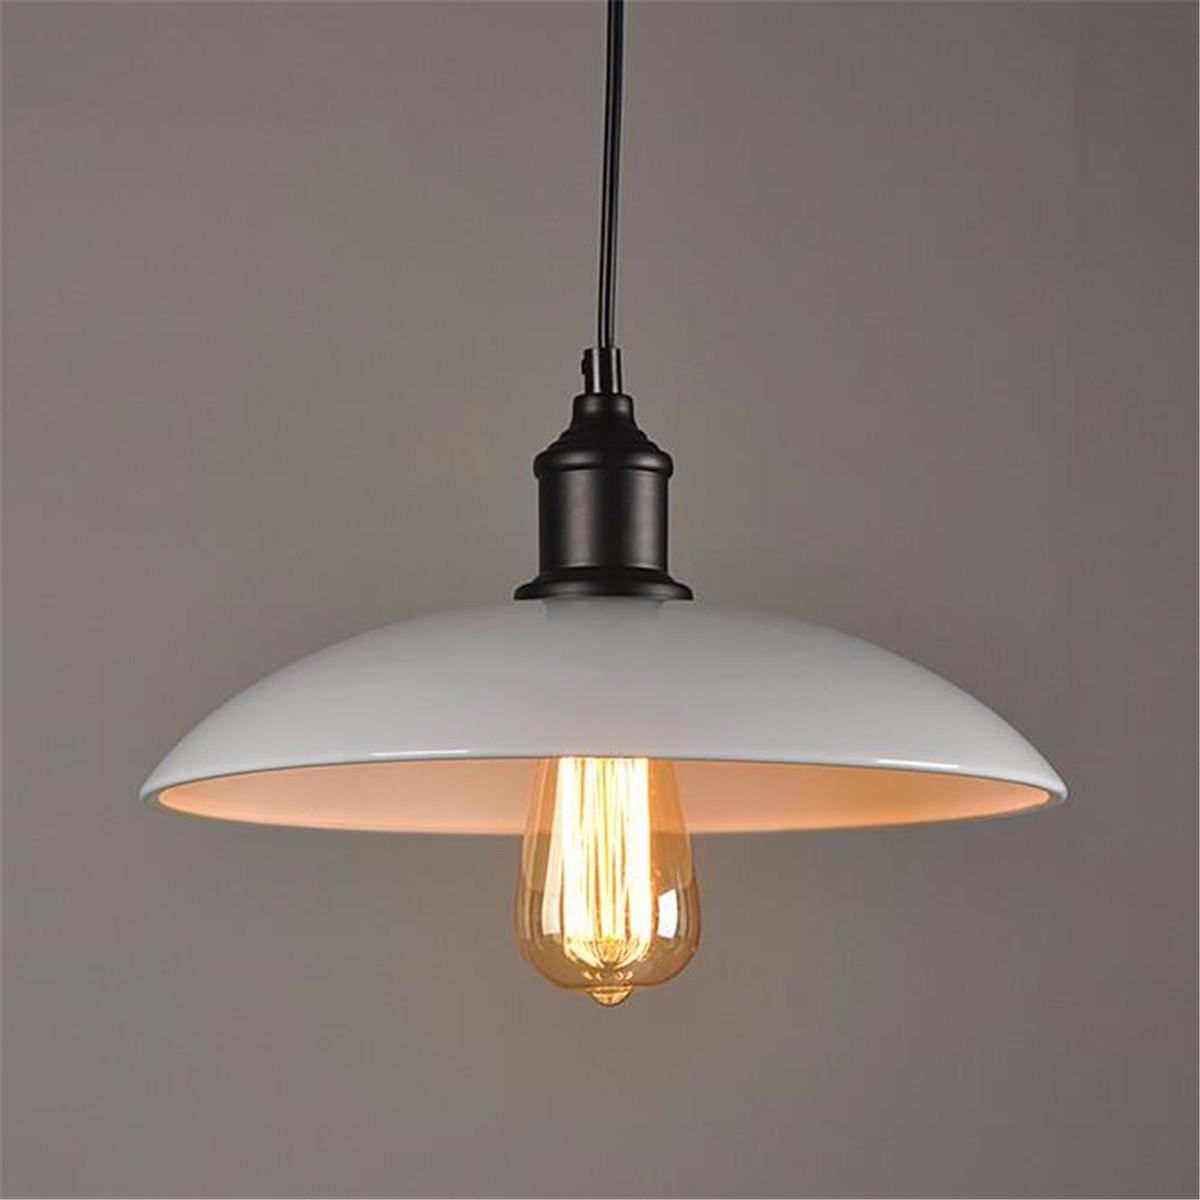 Vintage Home Room Ceiling Light Pendant Lamp Fixture